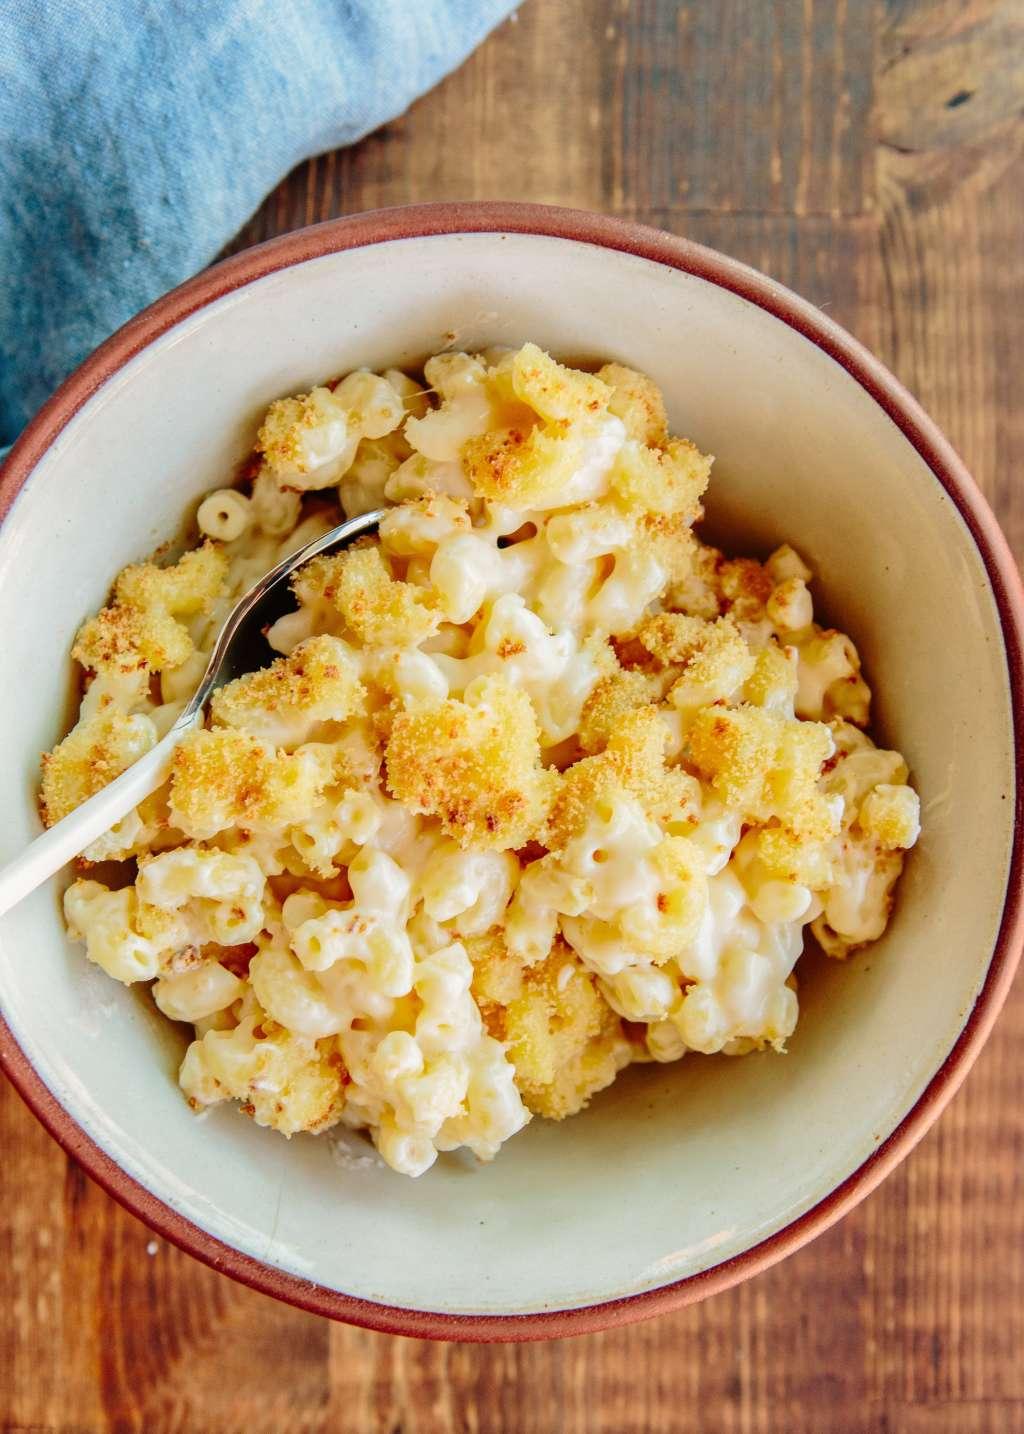 How To Make Classic Baked Macaroni & Cheese